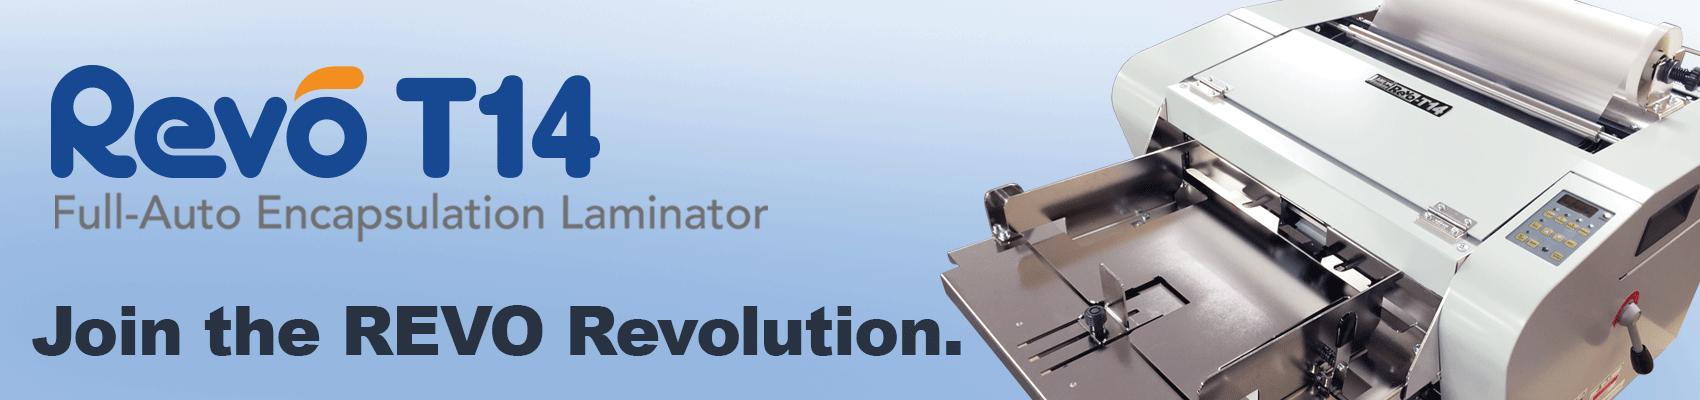 LAMI Revo T-14 Automatic Laminators